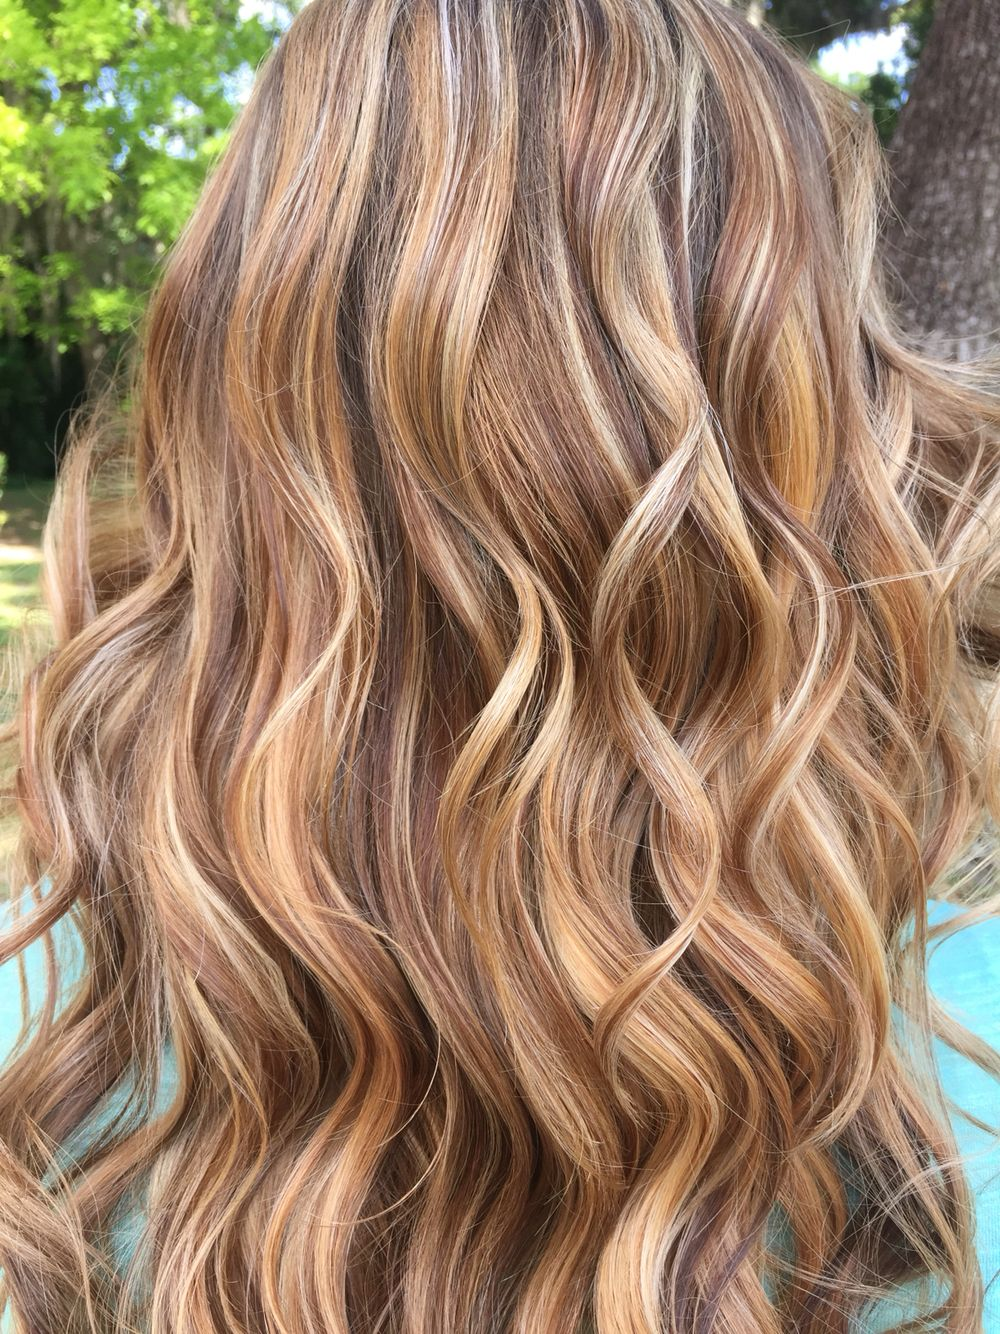 Pin By Carmen Beeton On Hair Pinterest Hair Style Hair